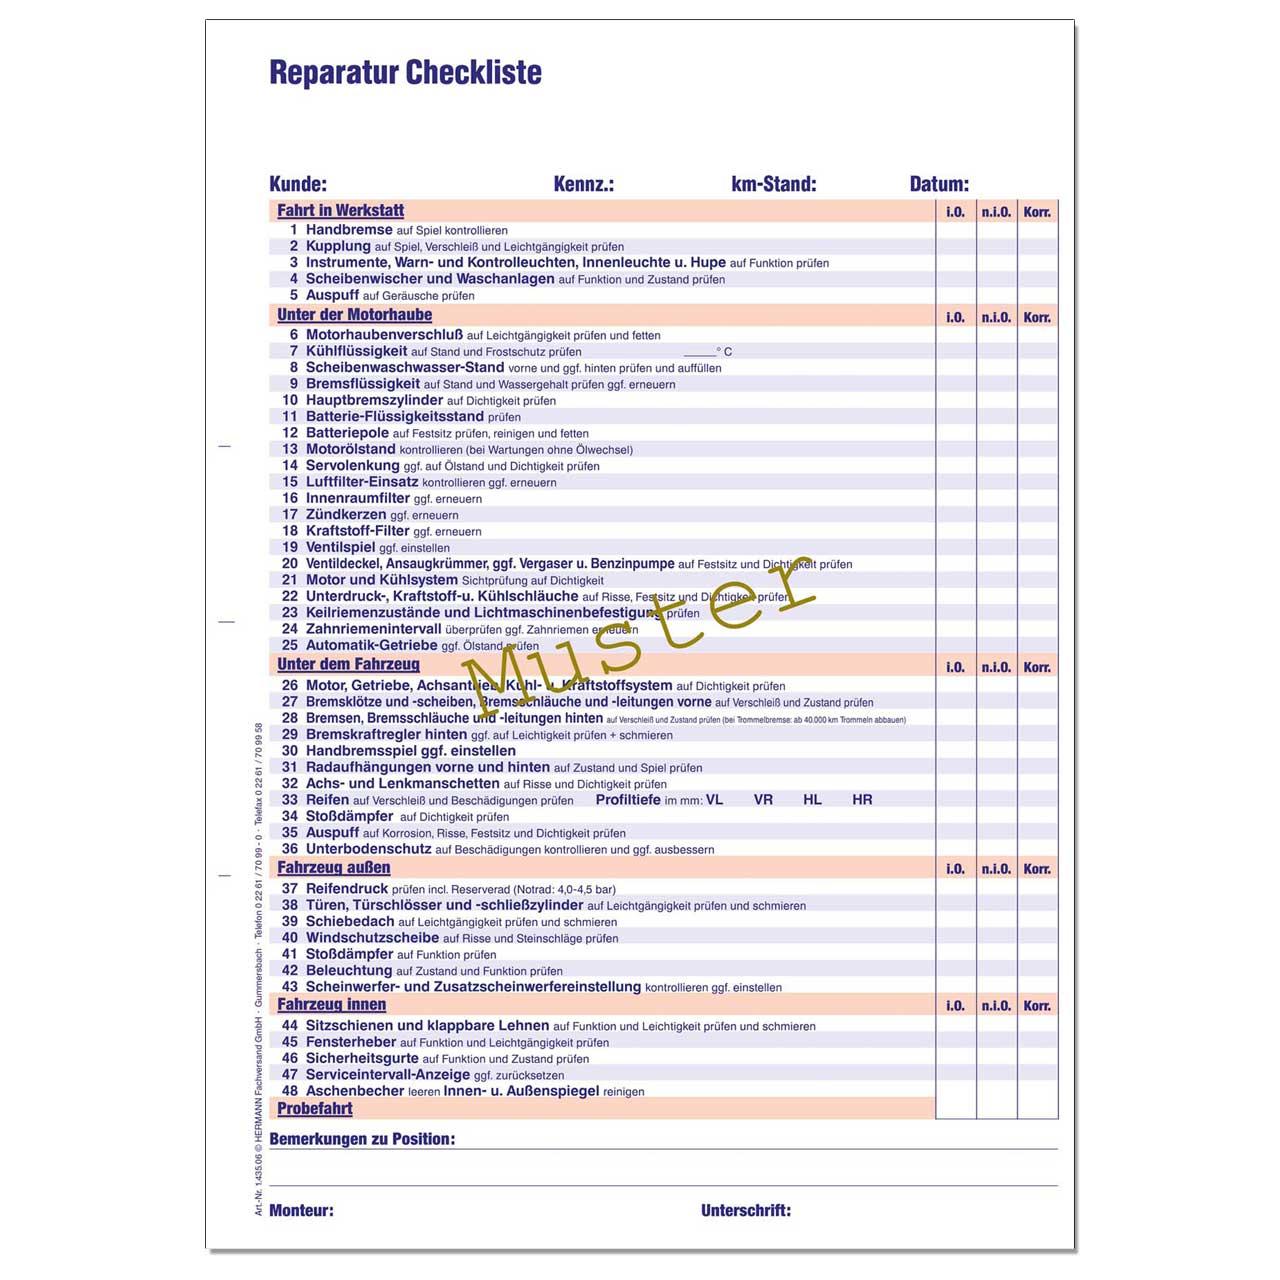 reparatur checkliste din a4 werkstattformulare kfz. Black Bedroom Furniture Sets. Home Design Ideas